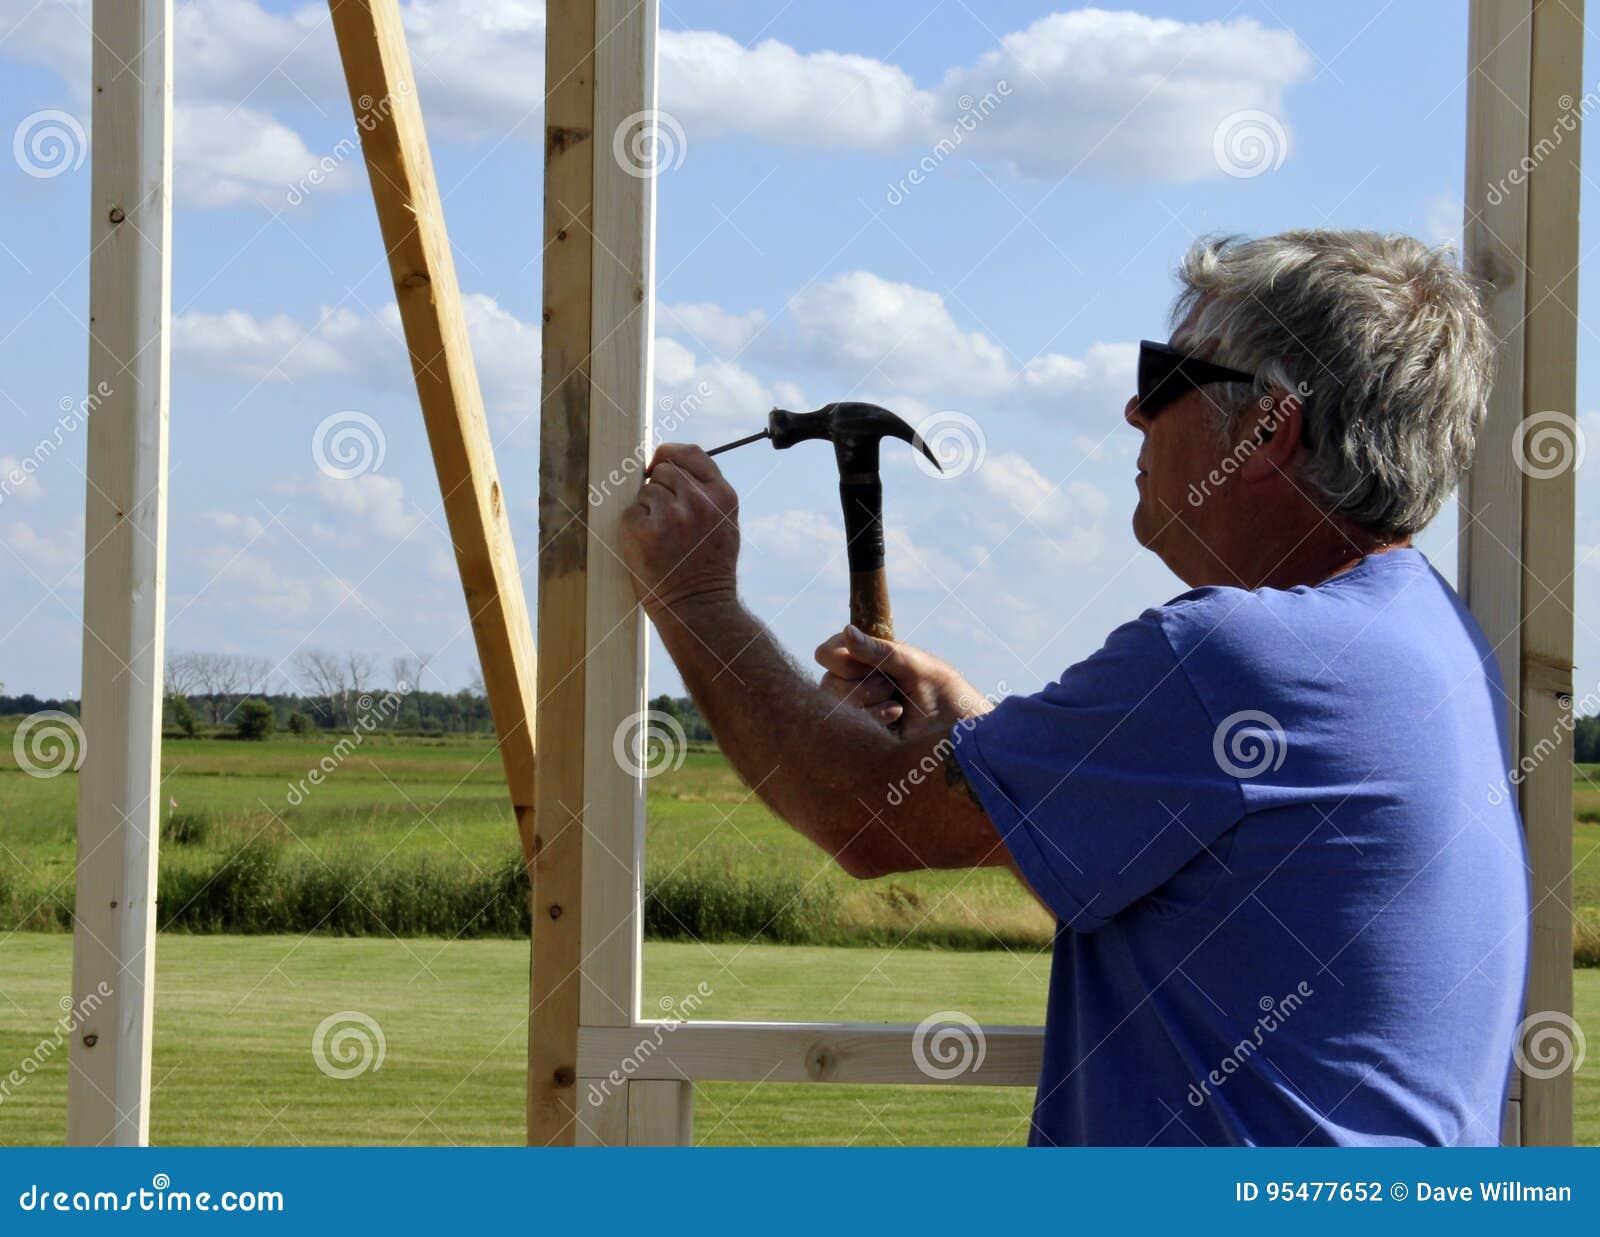 Carpenter nailing with a hammer